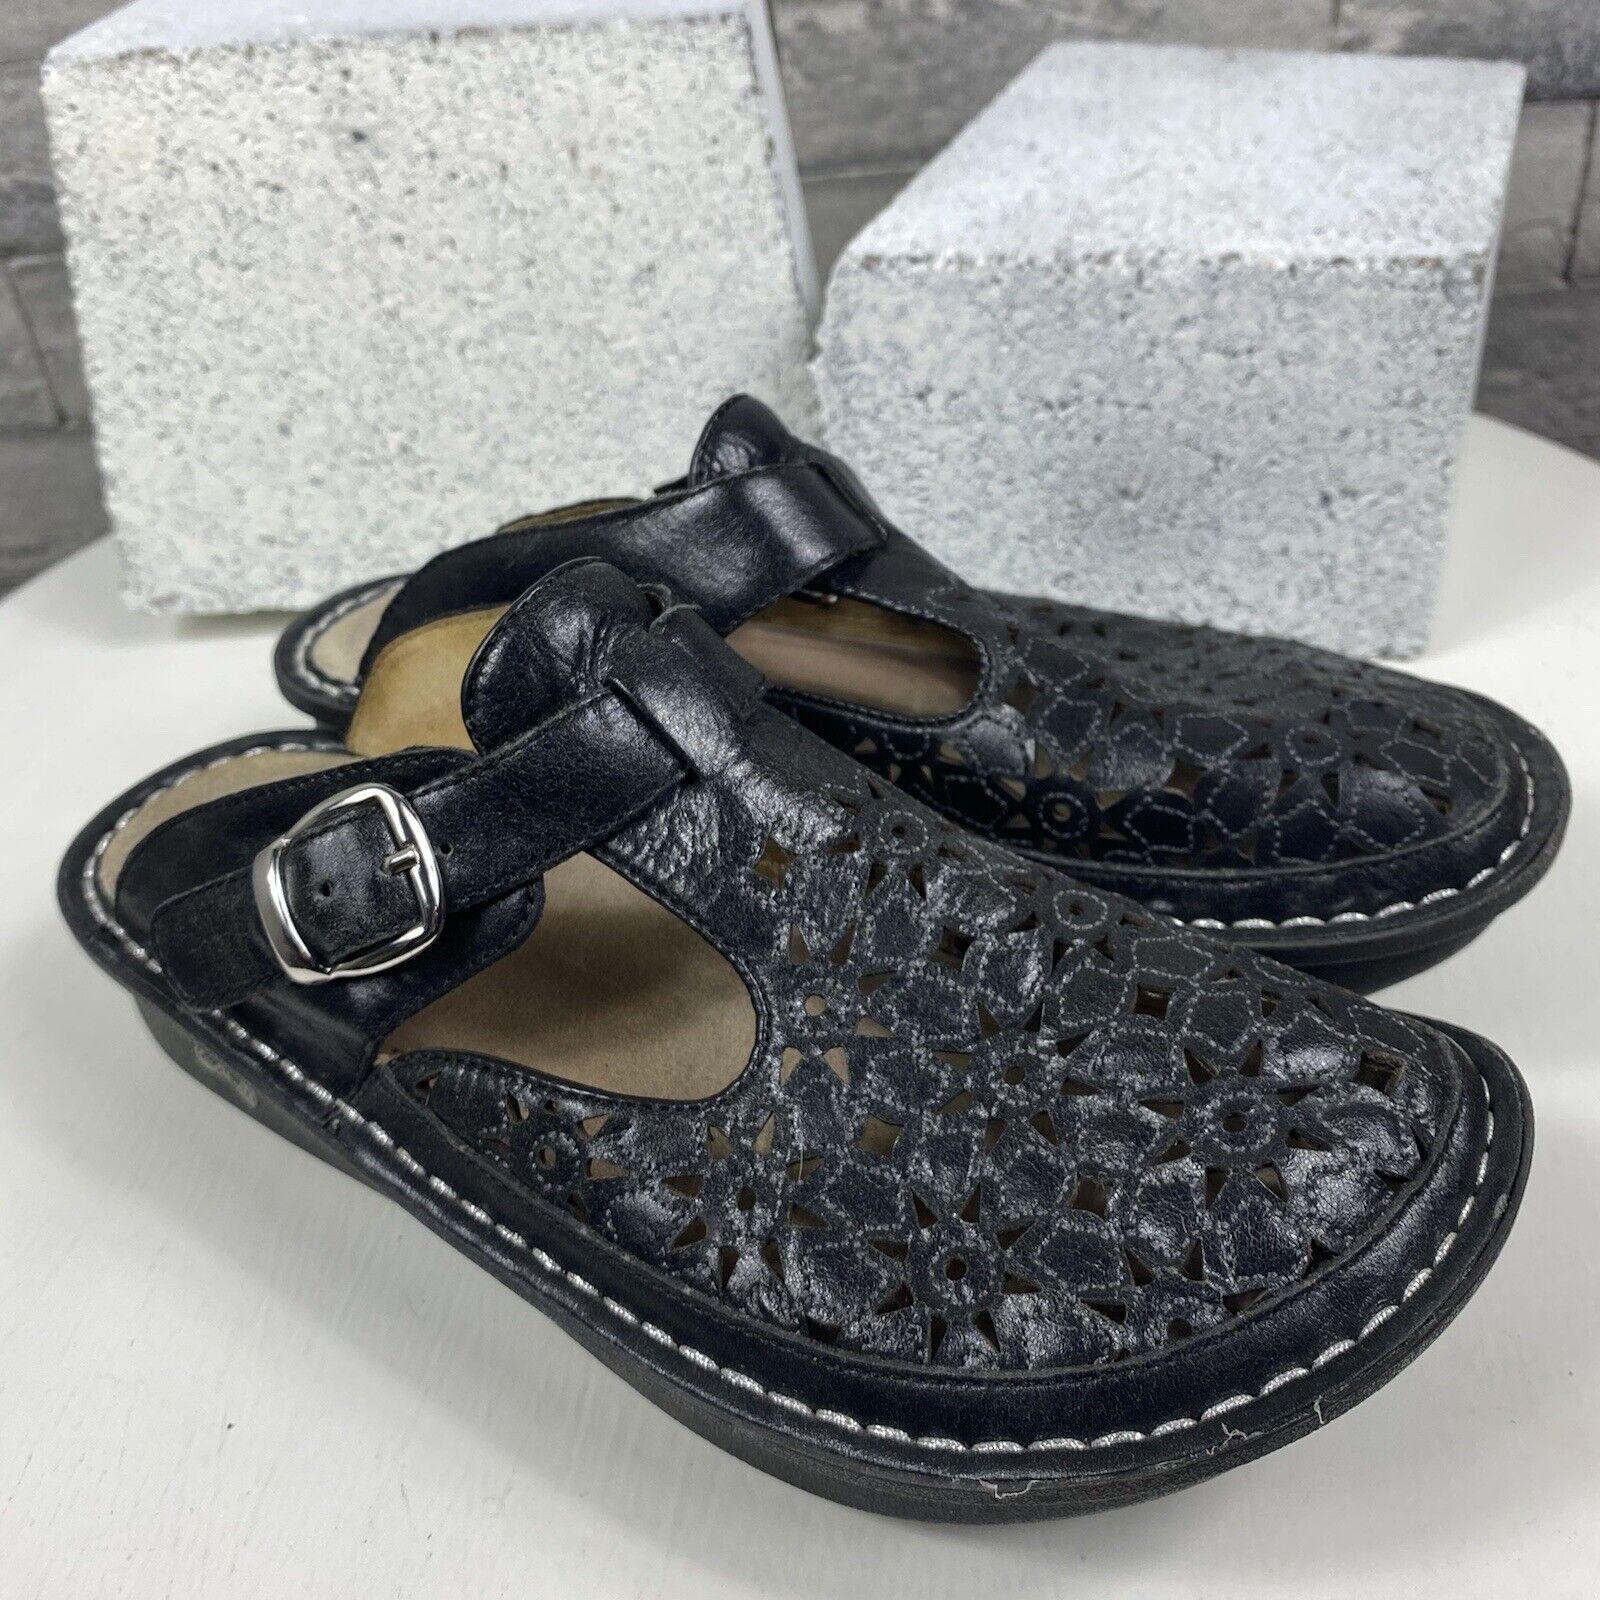 Alegria Classic Breezy Dusty Black Womens Shoes Clog Size 38